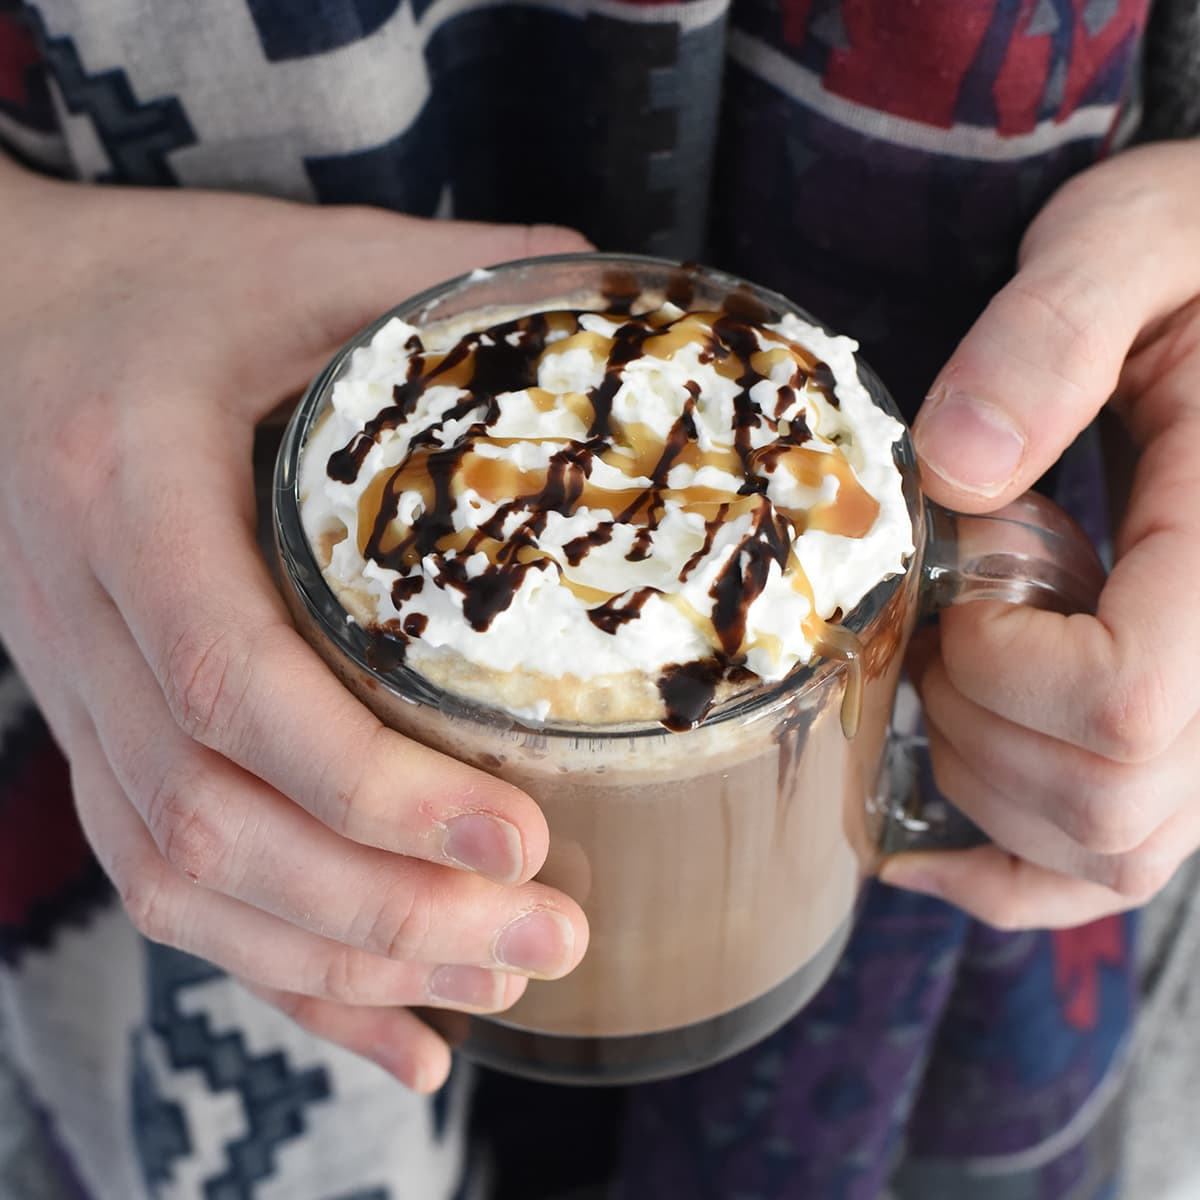 Salted caramel mocha in a glass mug being held.